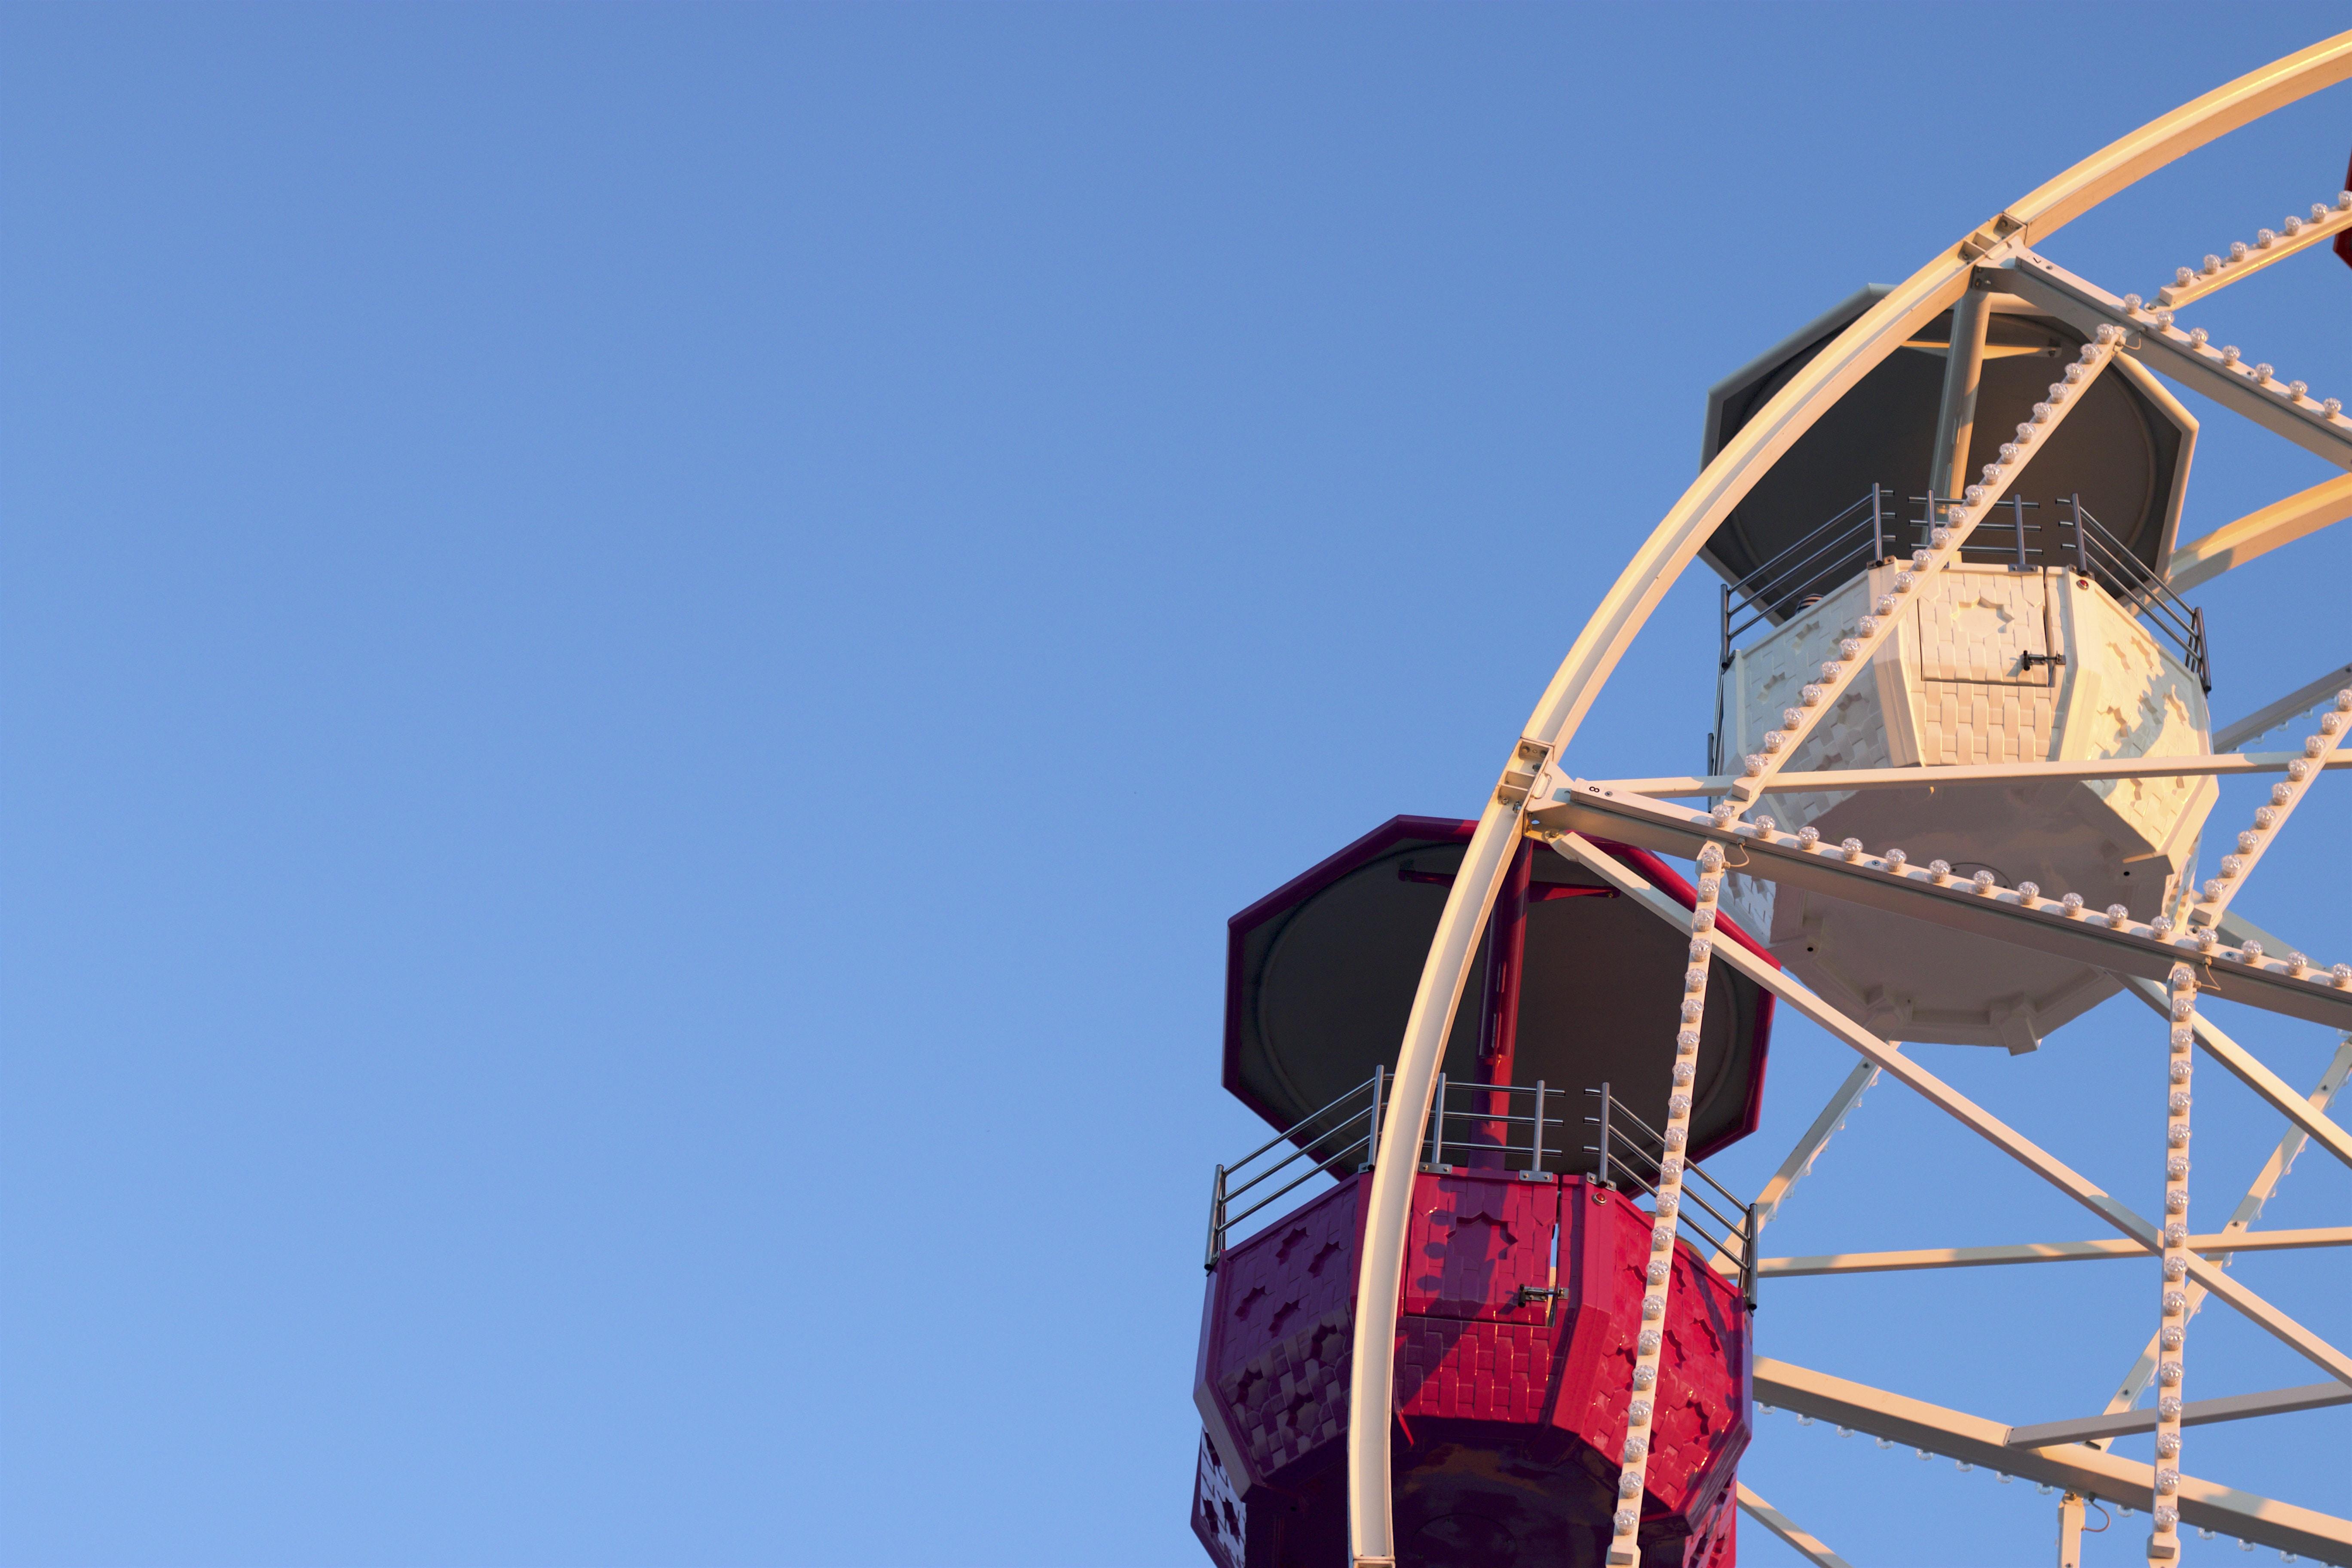 Fancy and colorful looking ferris wheel in Tibidabo carnival